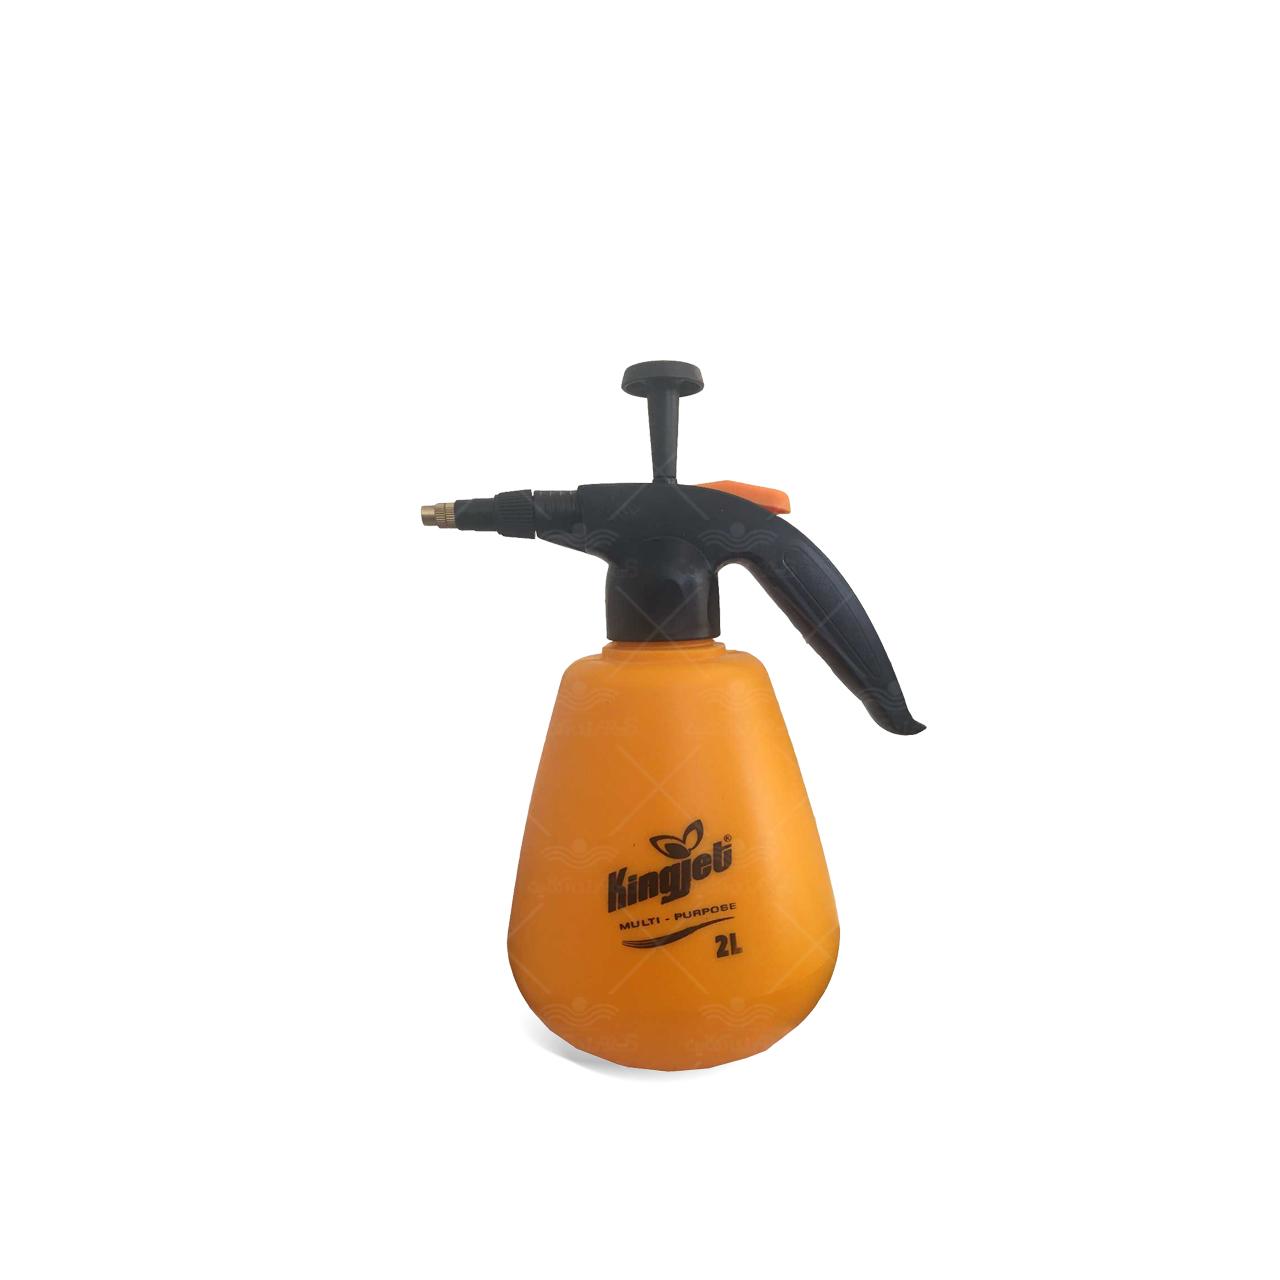 سمپاش دستی کینگ جت 2 لیتری